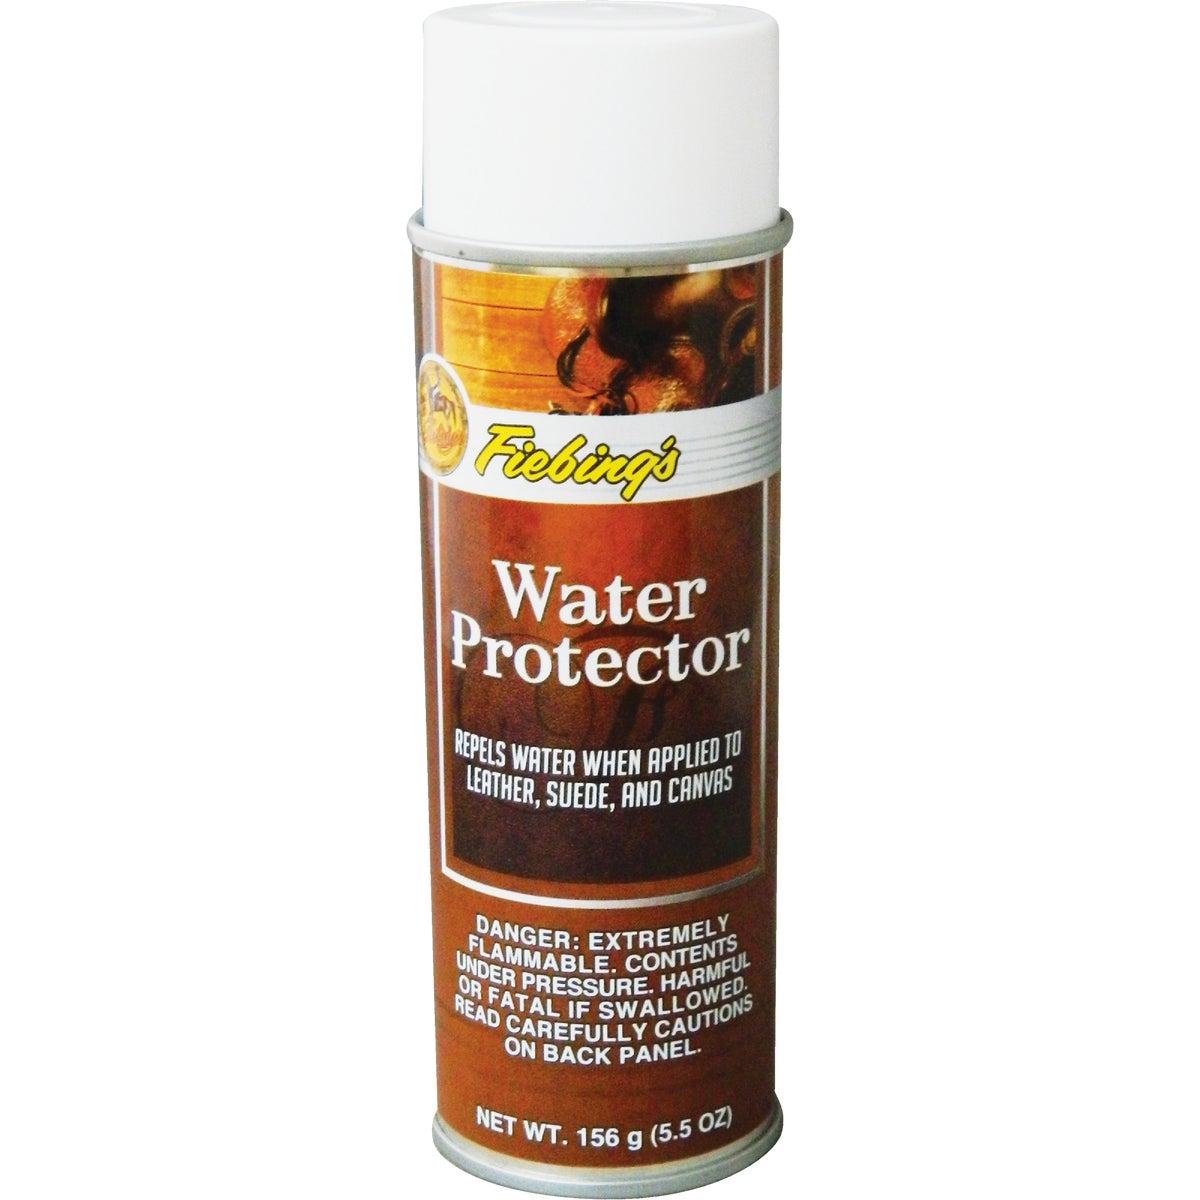 WATER & STAIN PROTECTOR - WATR00A005Z by Fiebing